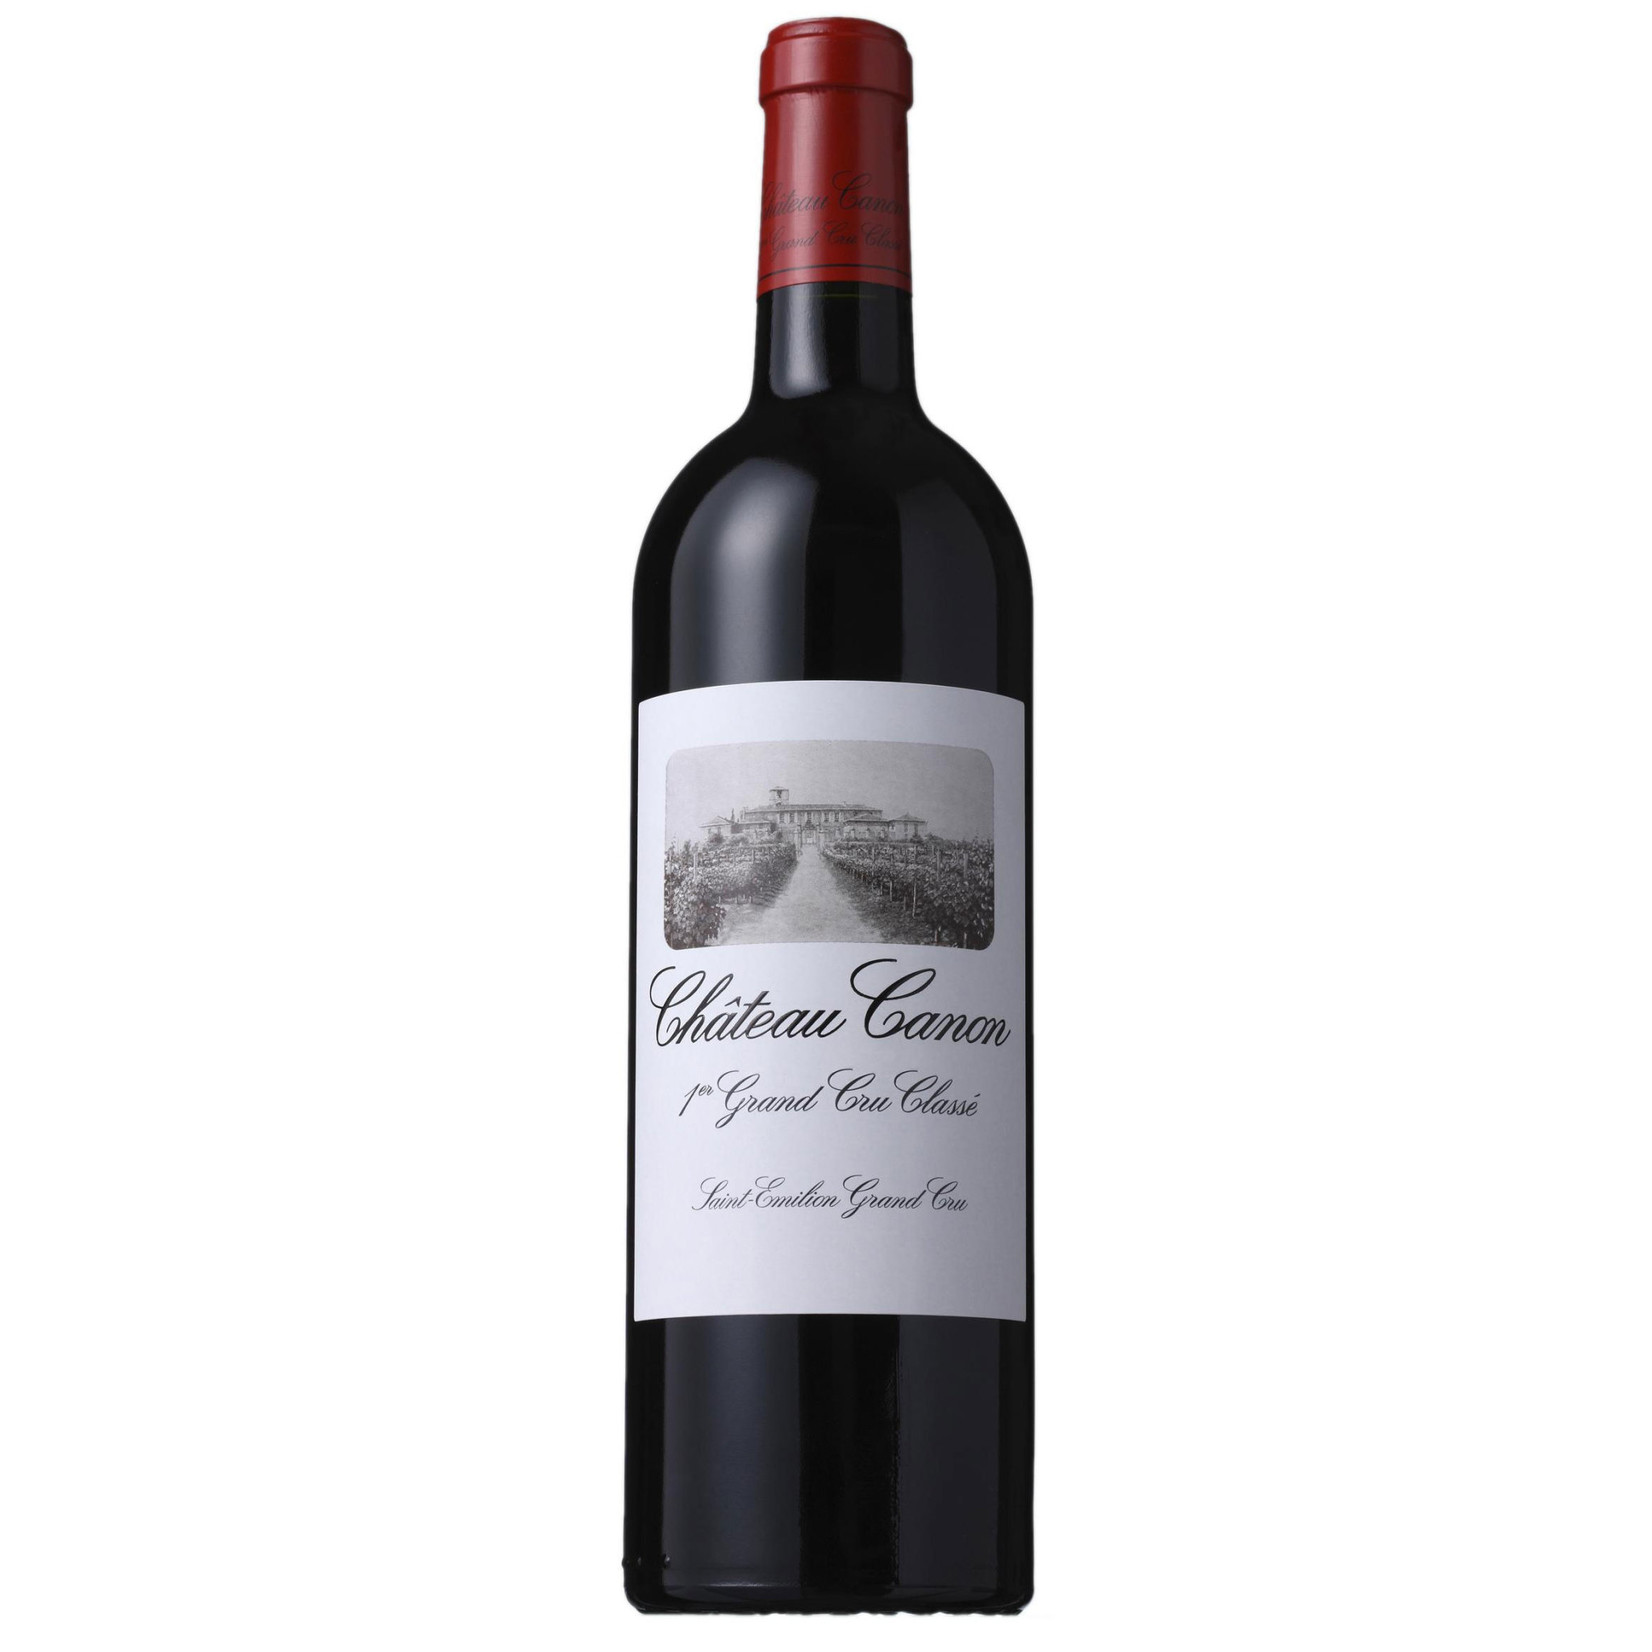 Wine Chateau Canon 2010